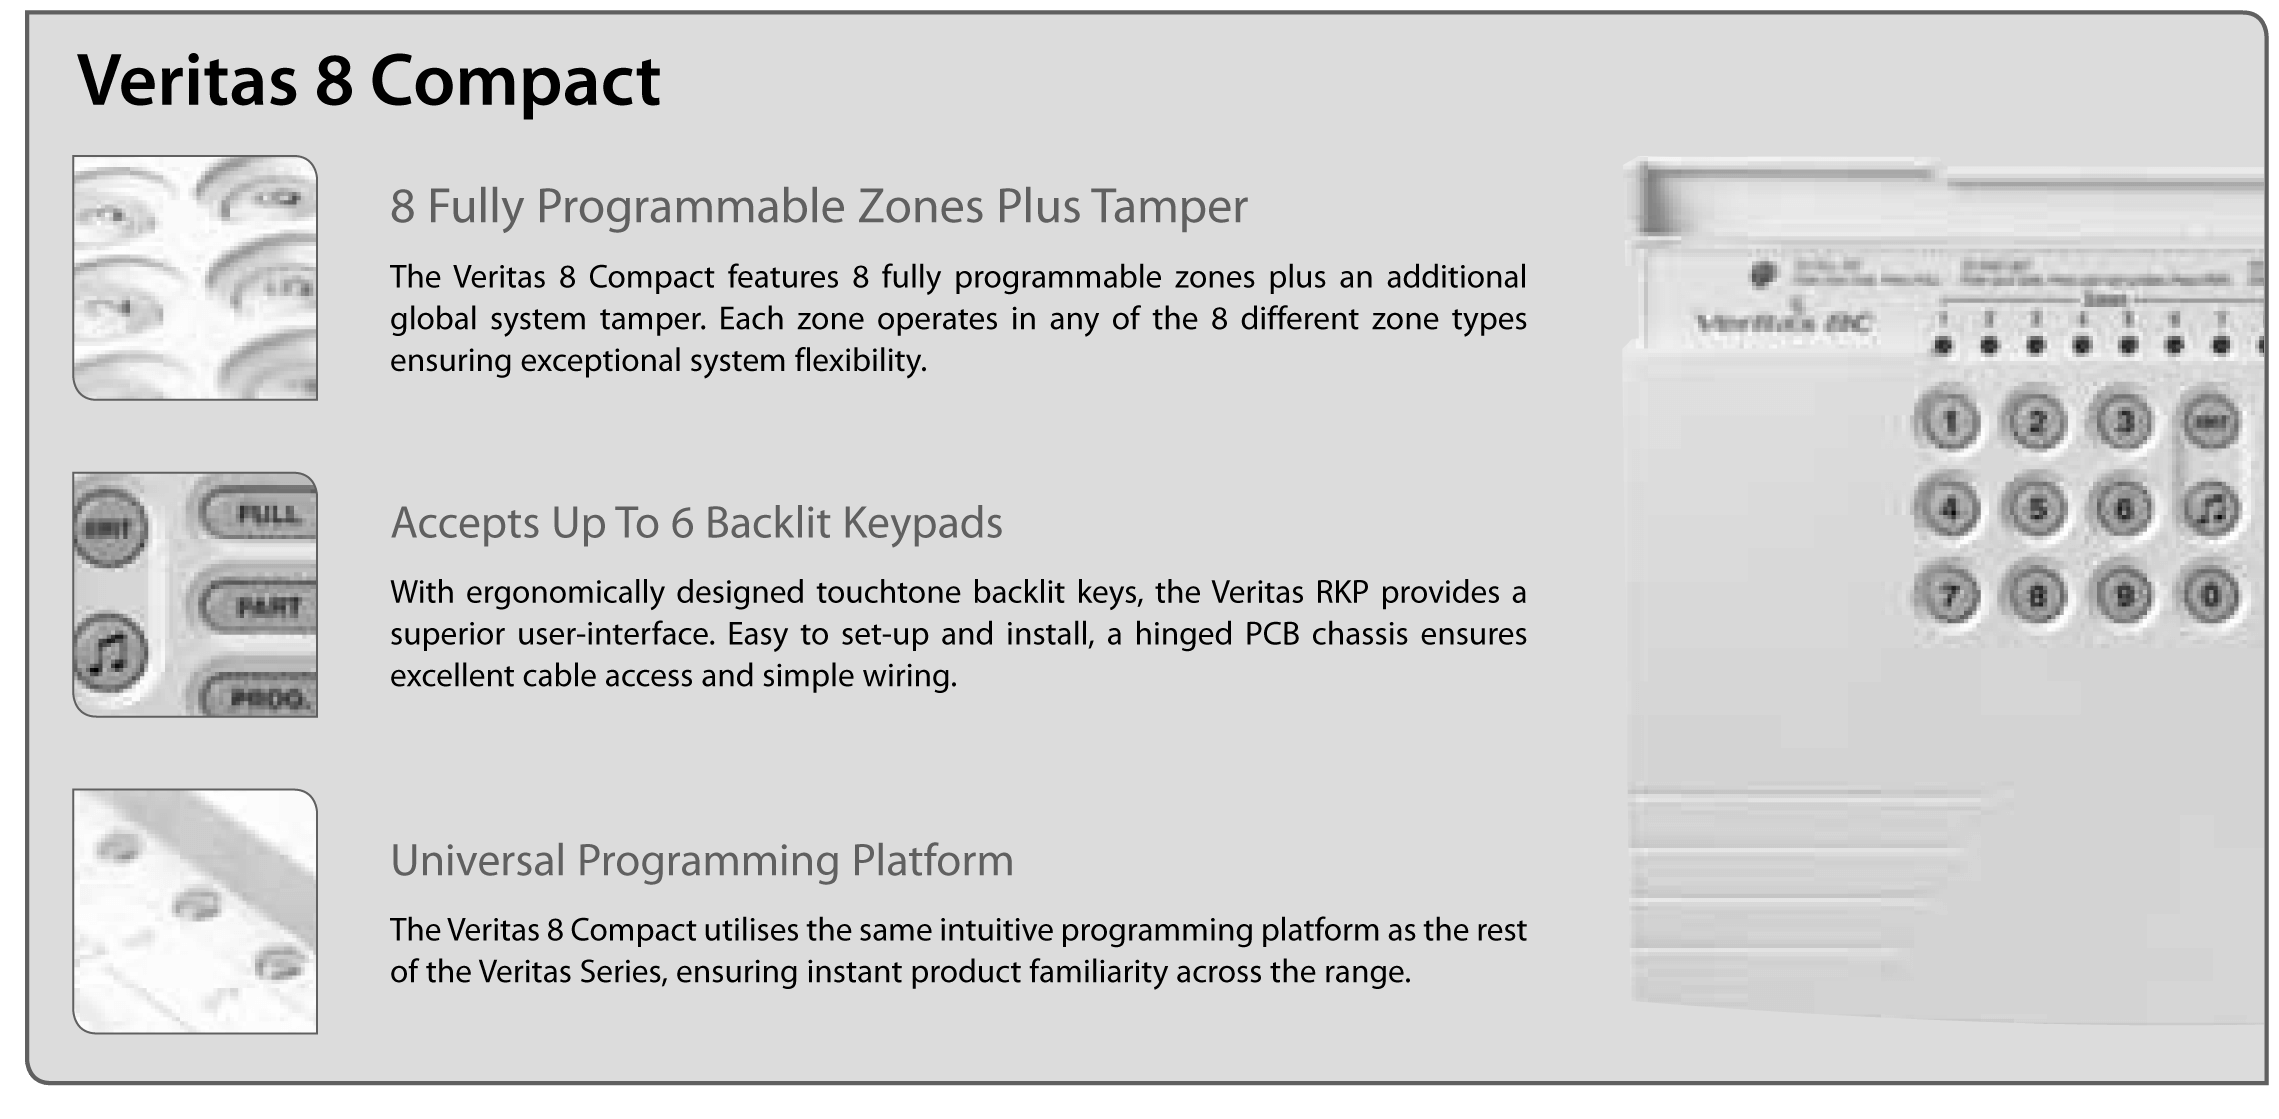 Burglar Alarm Cost >> Texecom Veritas 8 Compact with Key Switch Facility